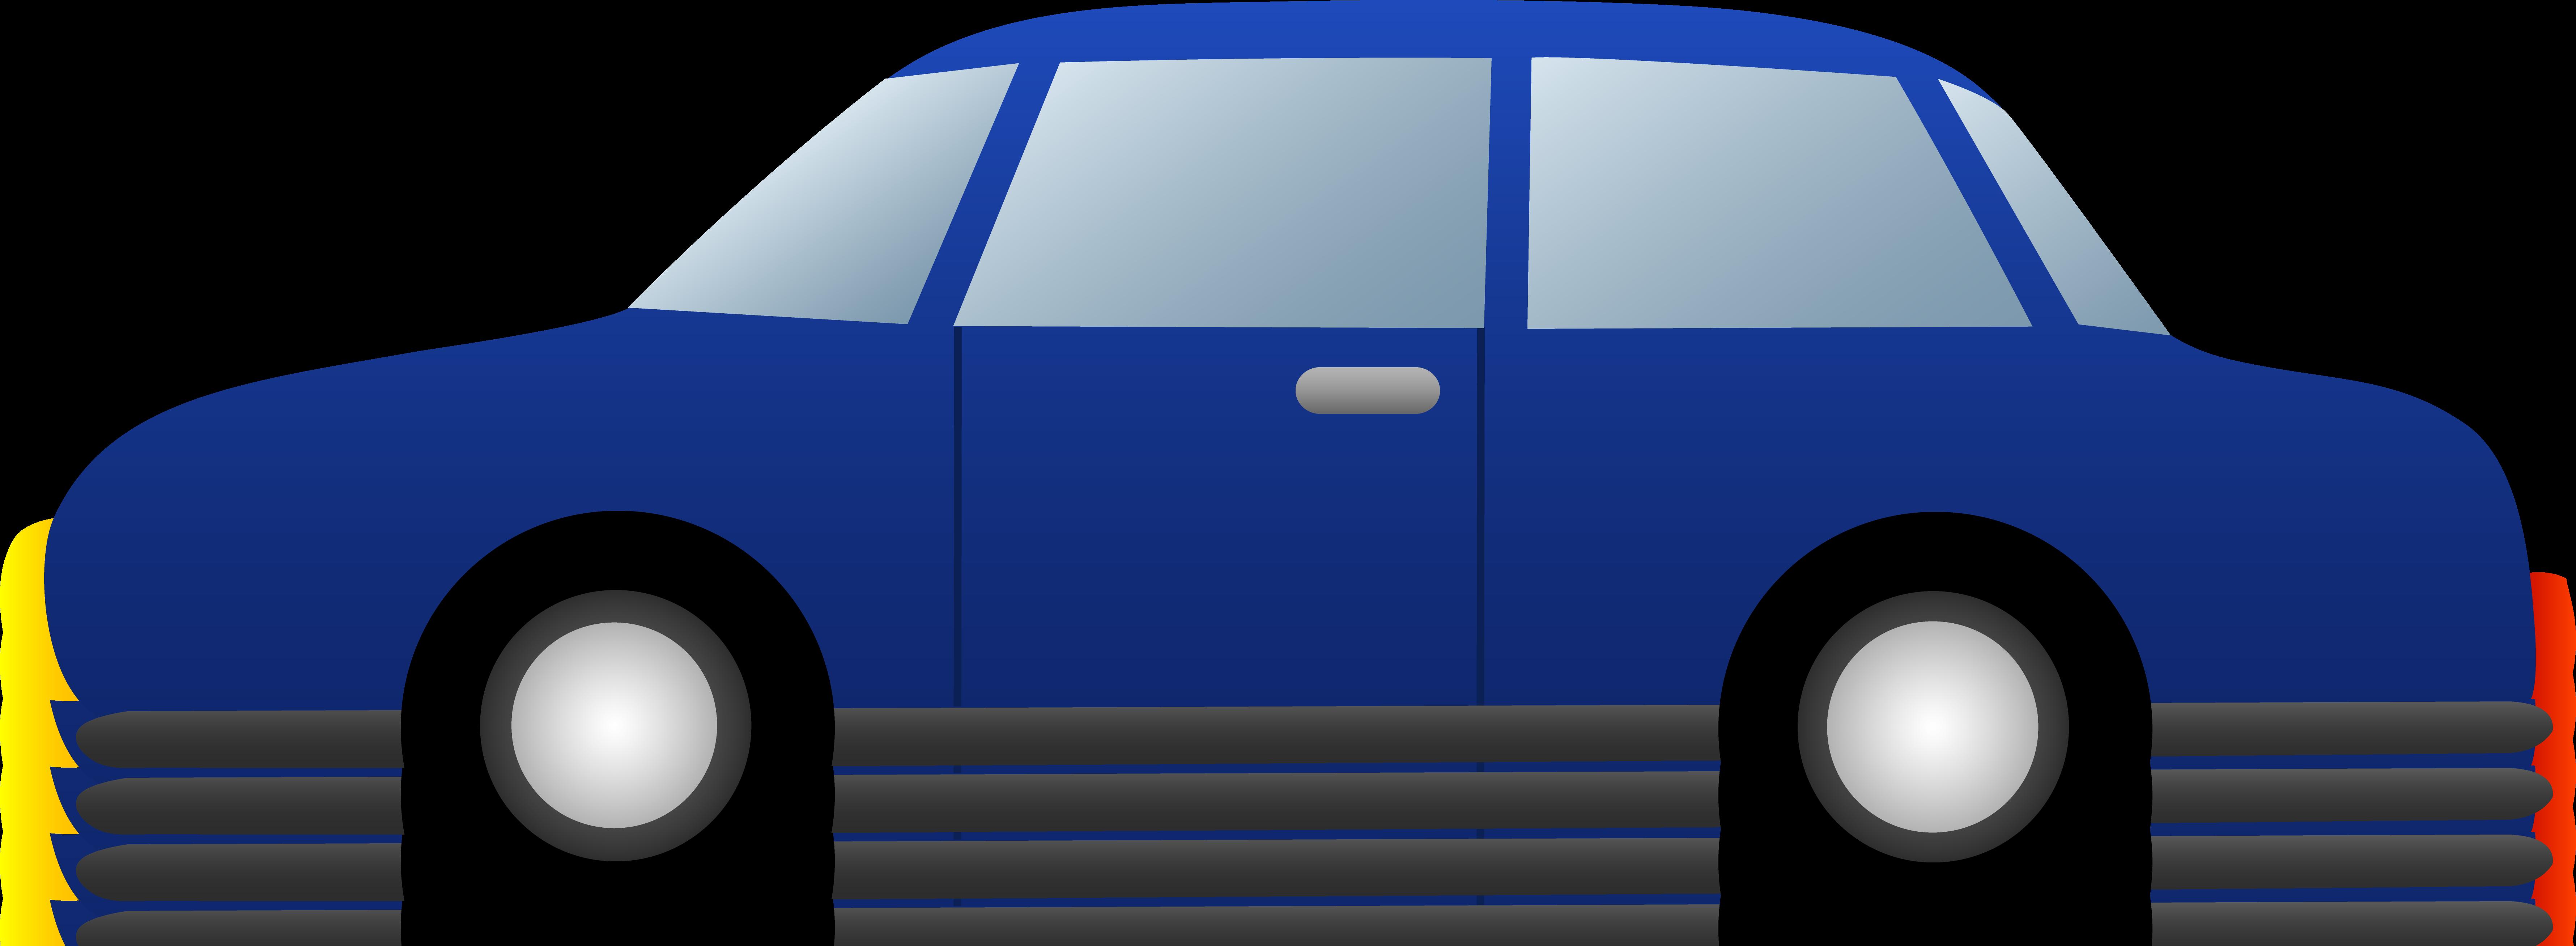 7122x2615 Cartoon Cars Clipart